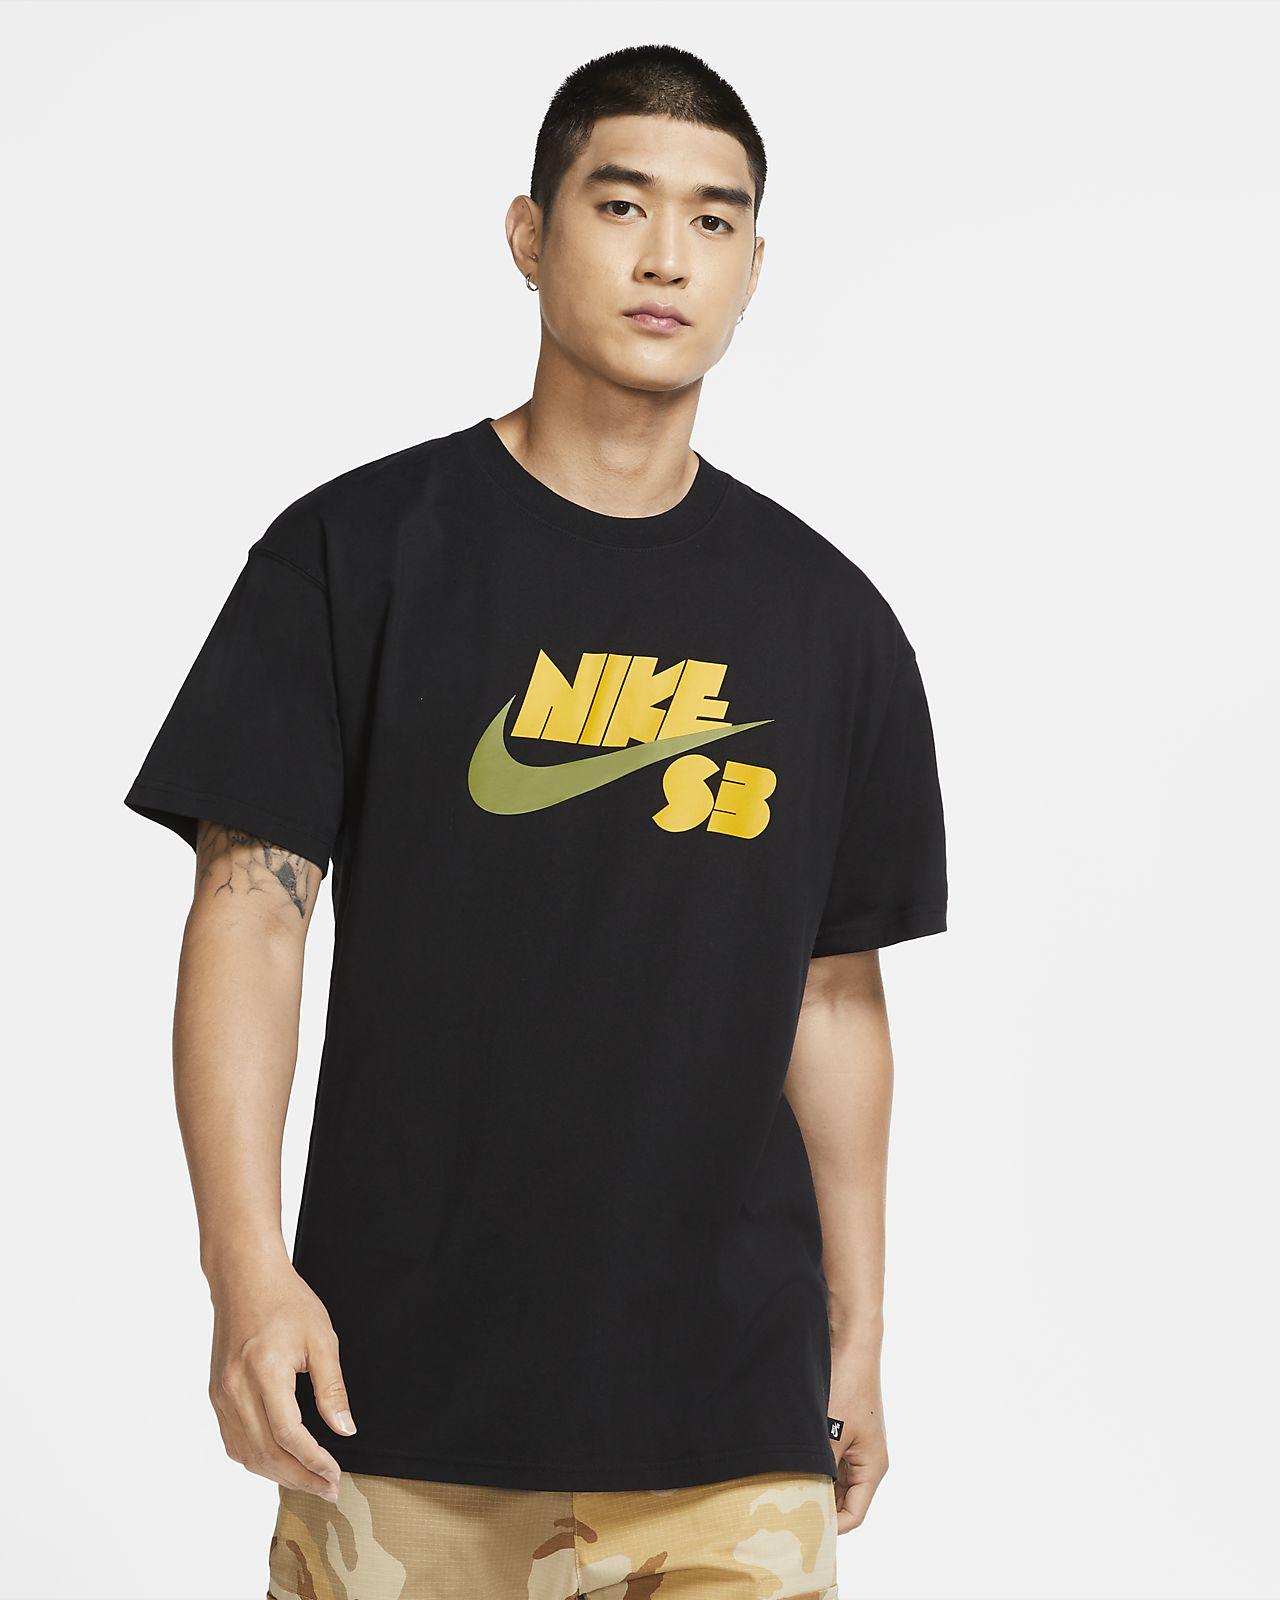 T-shirt da skate con logo stagionale Nike SB - Uomo